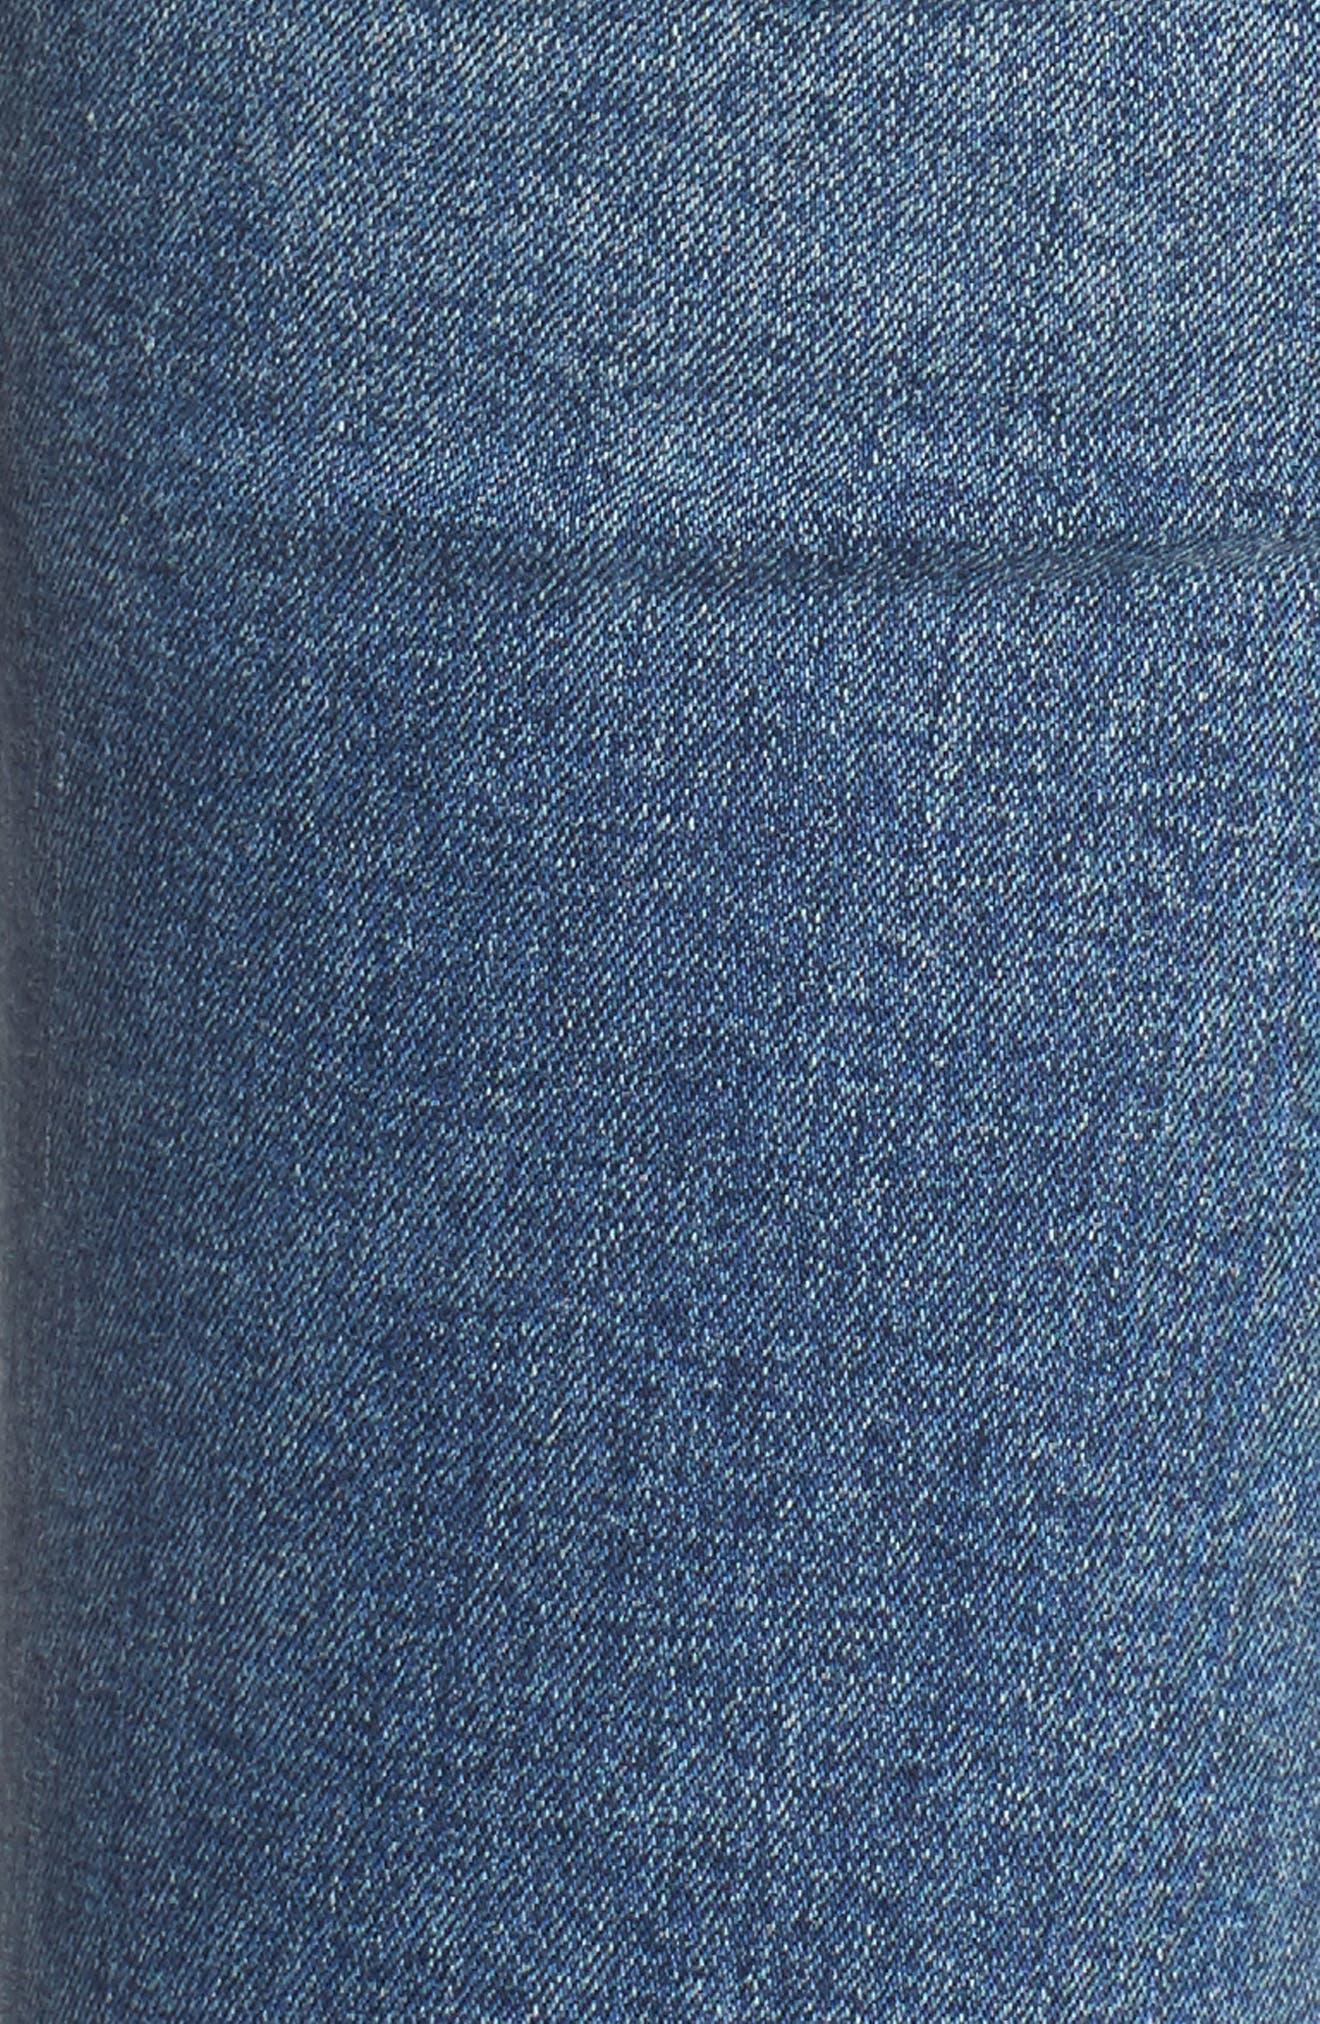 Rocket Crop Skinny Jeans,                             Alternate thumbnail 6, color,